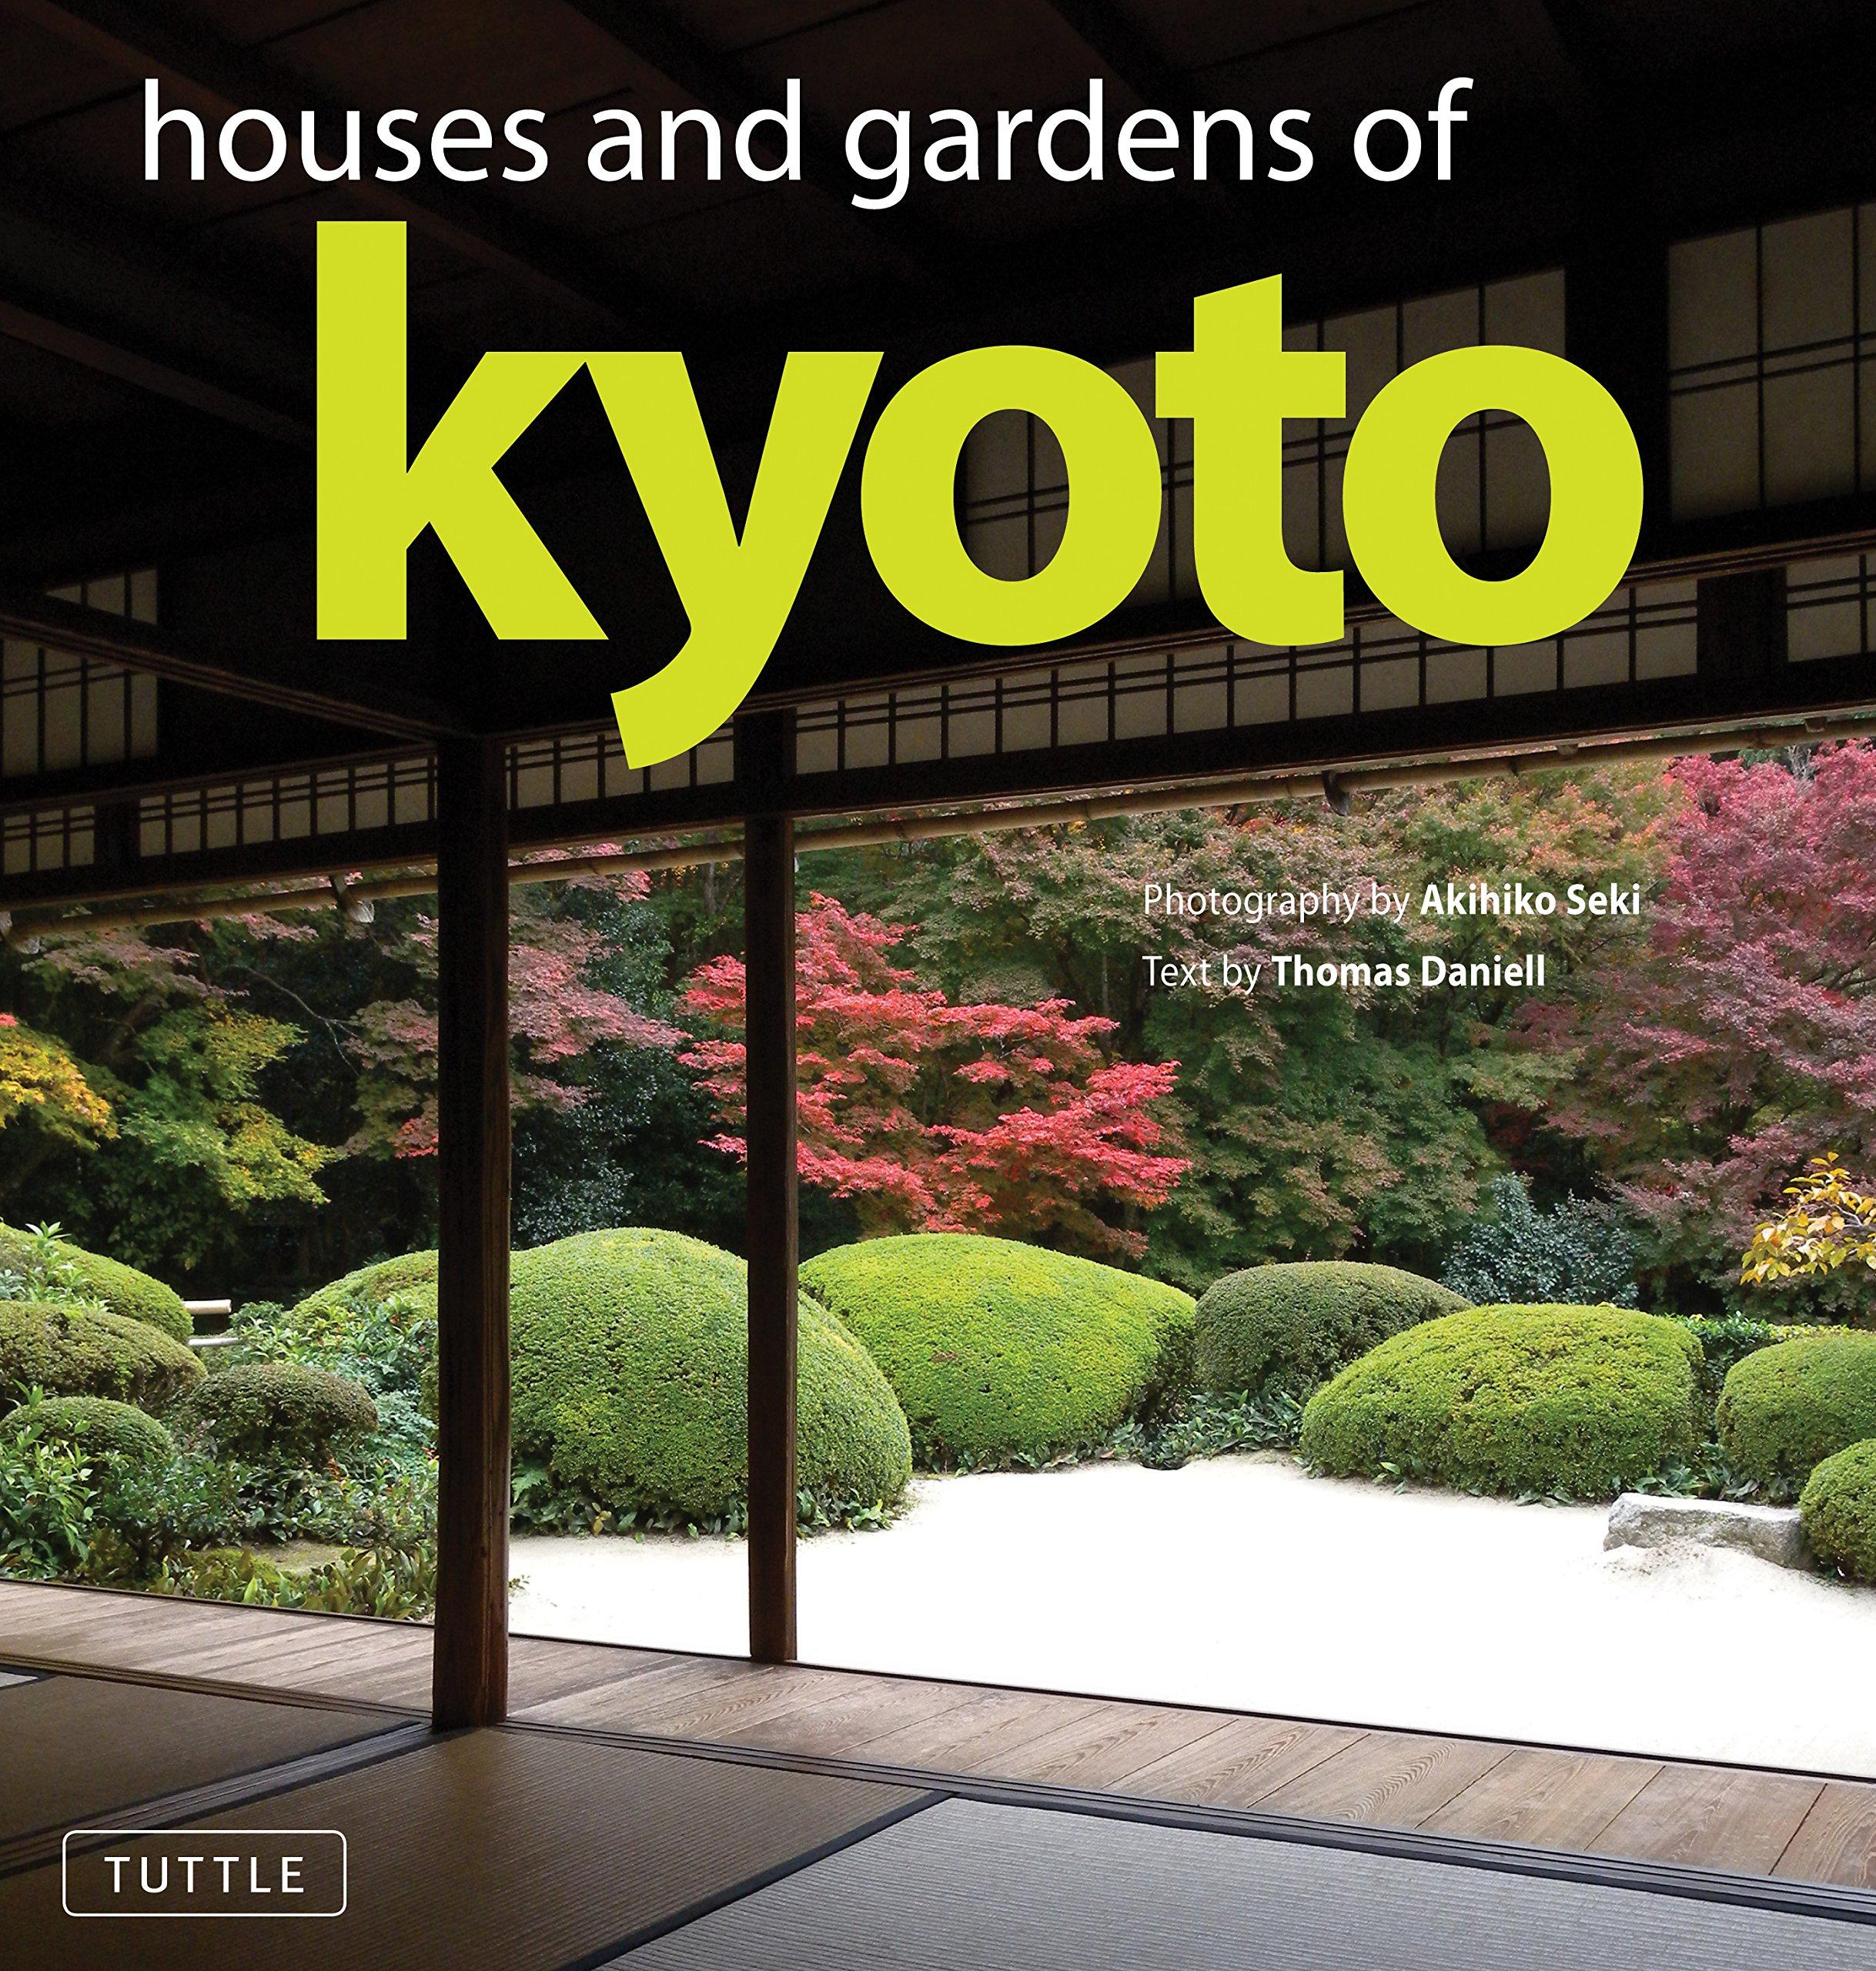 houses and gardens of kyoto thomas daniell akihiko seki 9784805310915 amazoncom books - Houses Garden